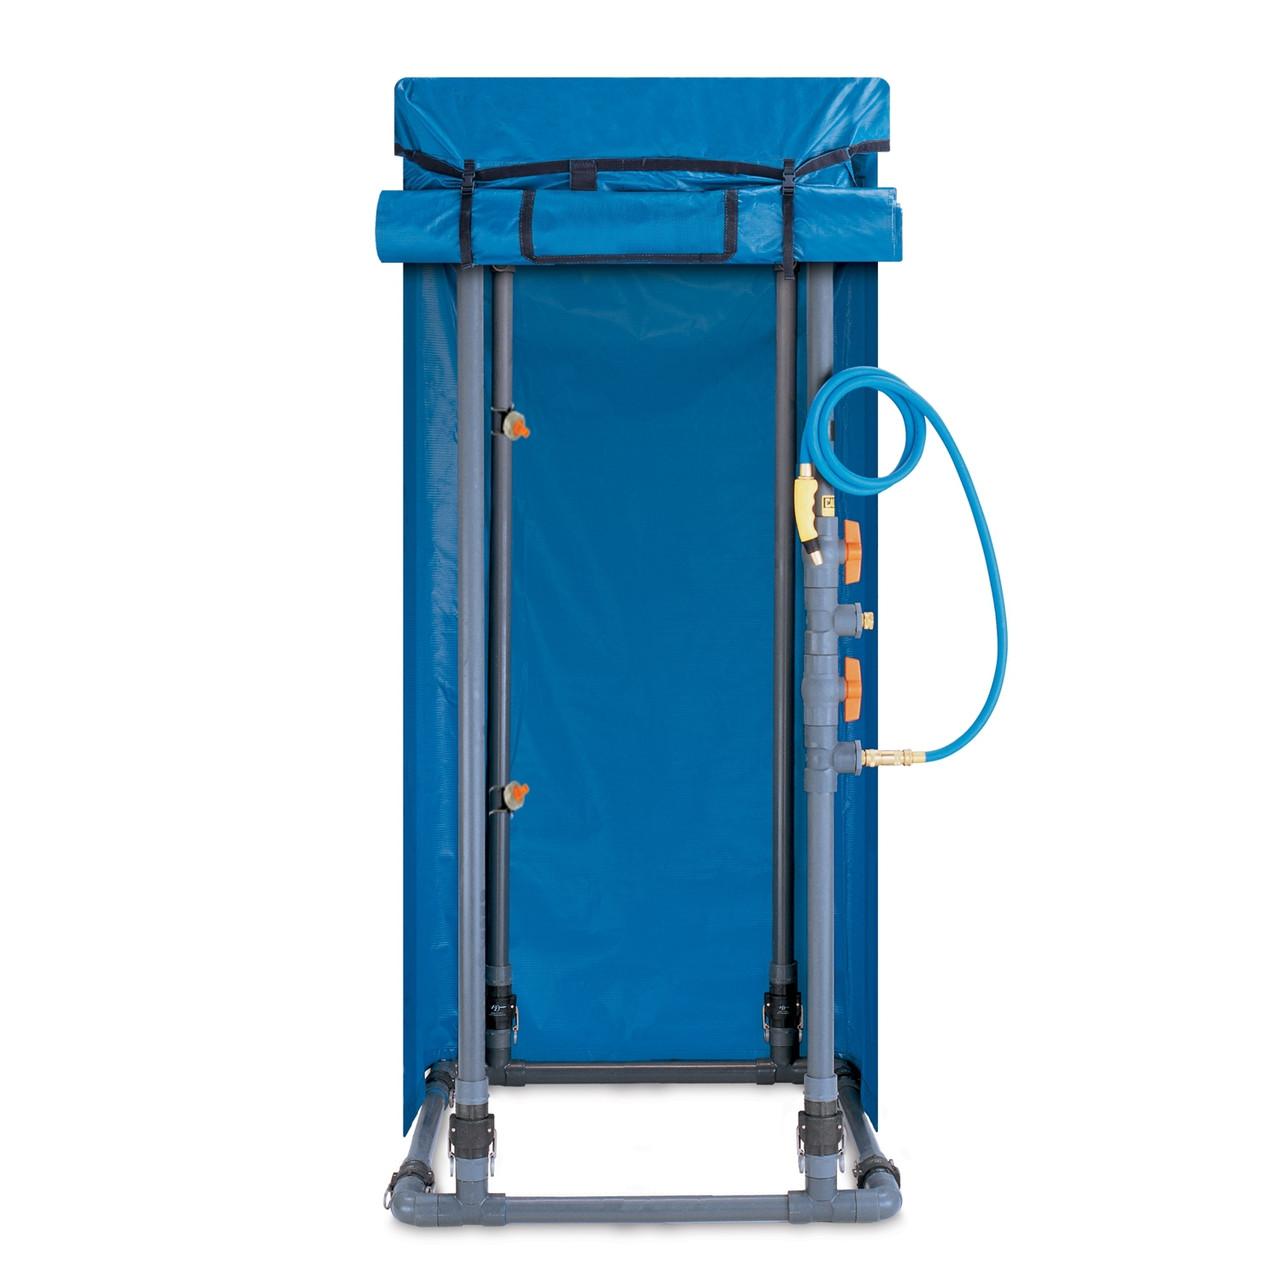 DQE Standard Decontamination Shower # HM1001C - Careforde Healthcare ...